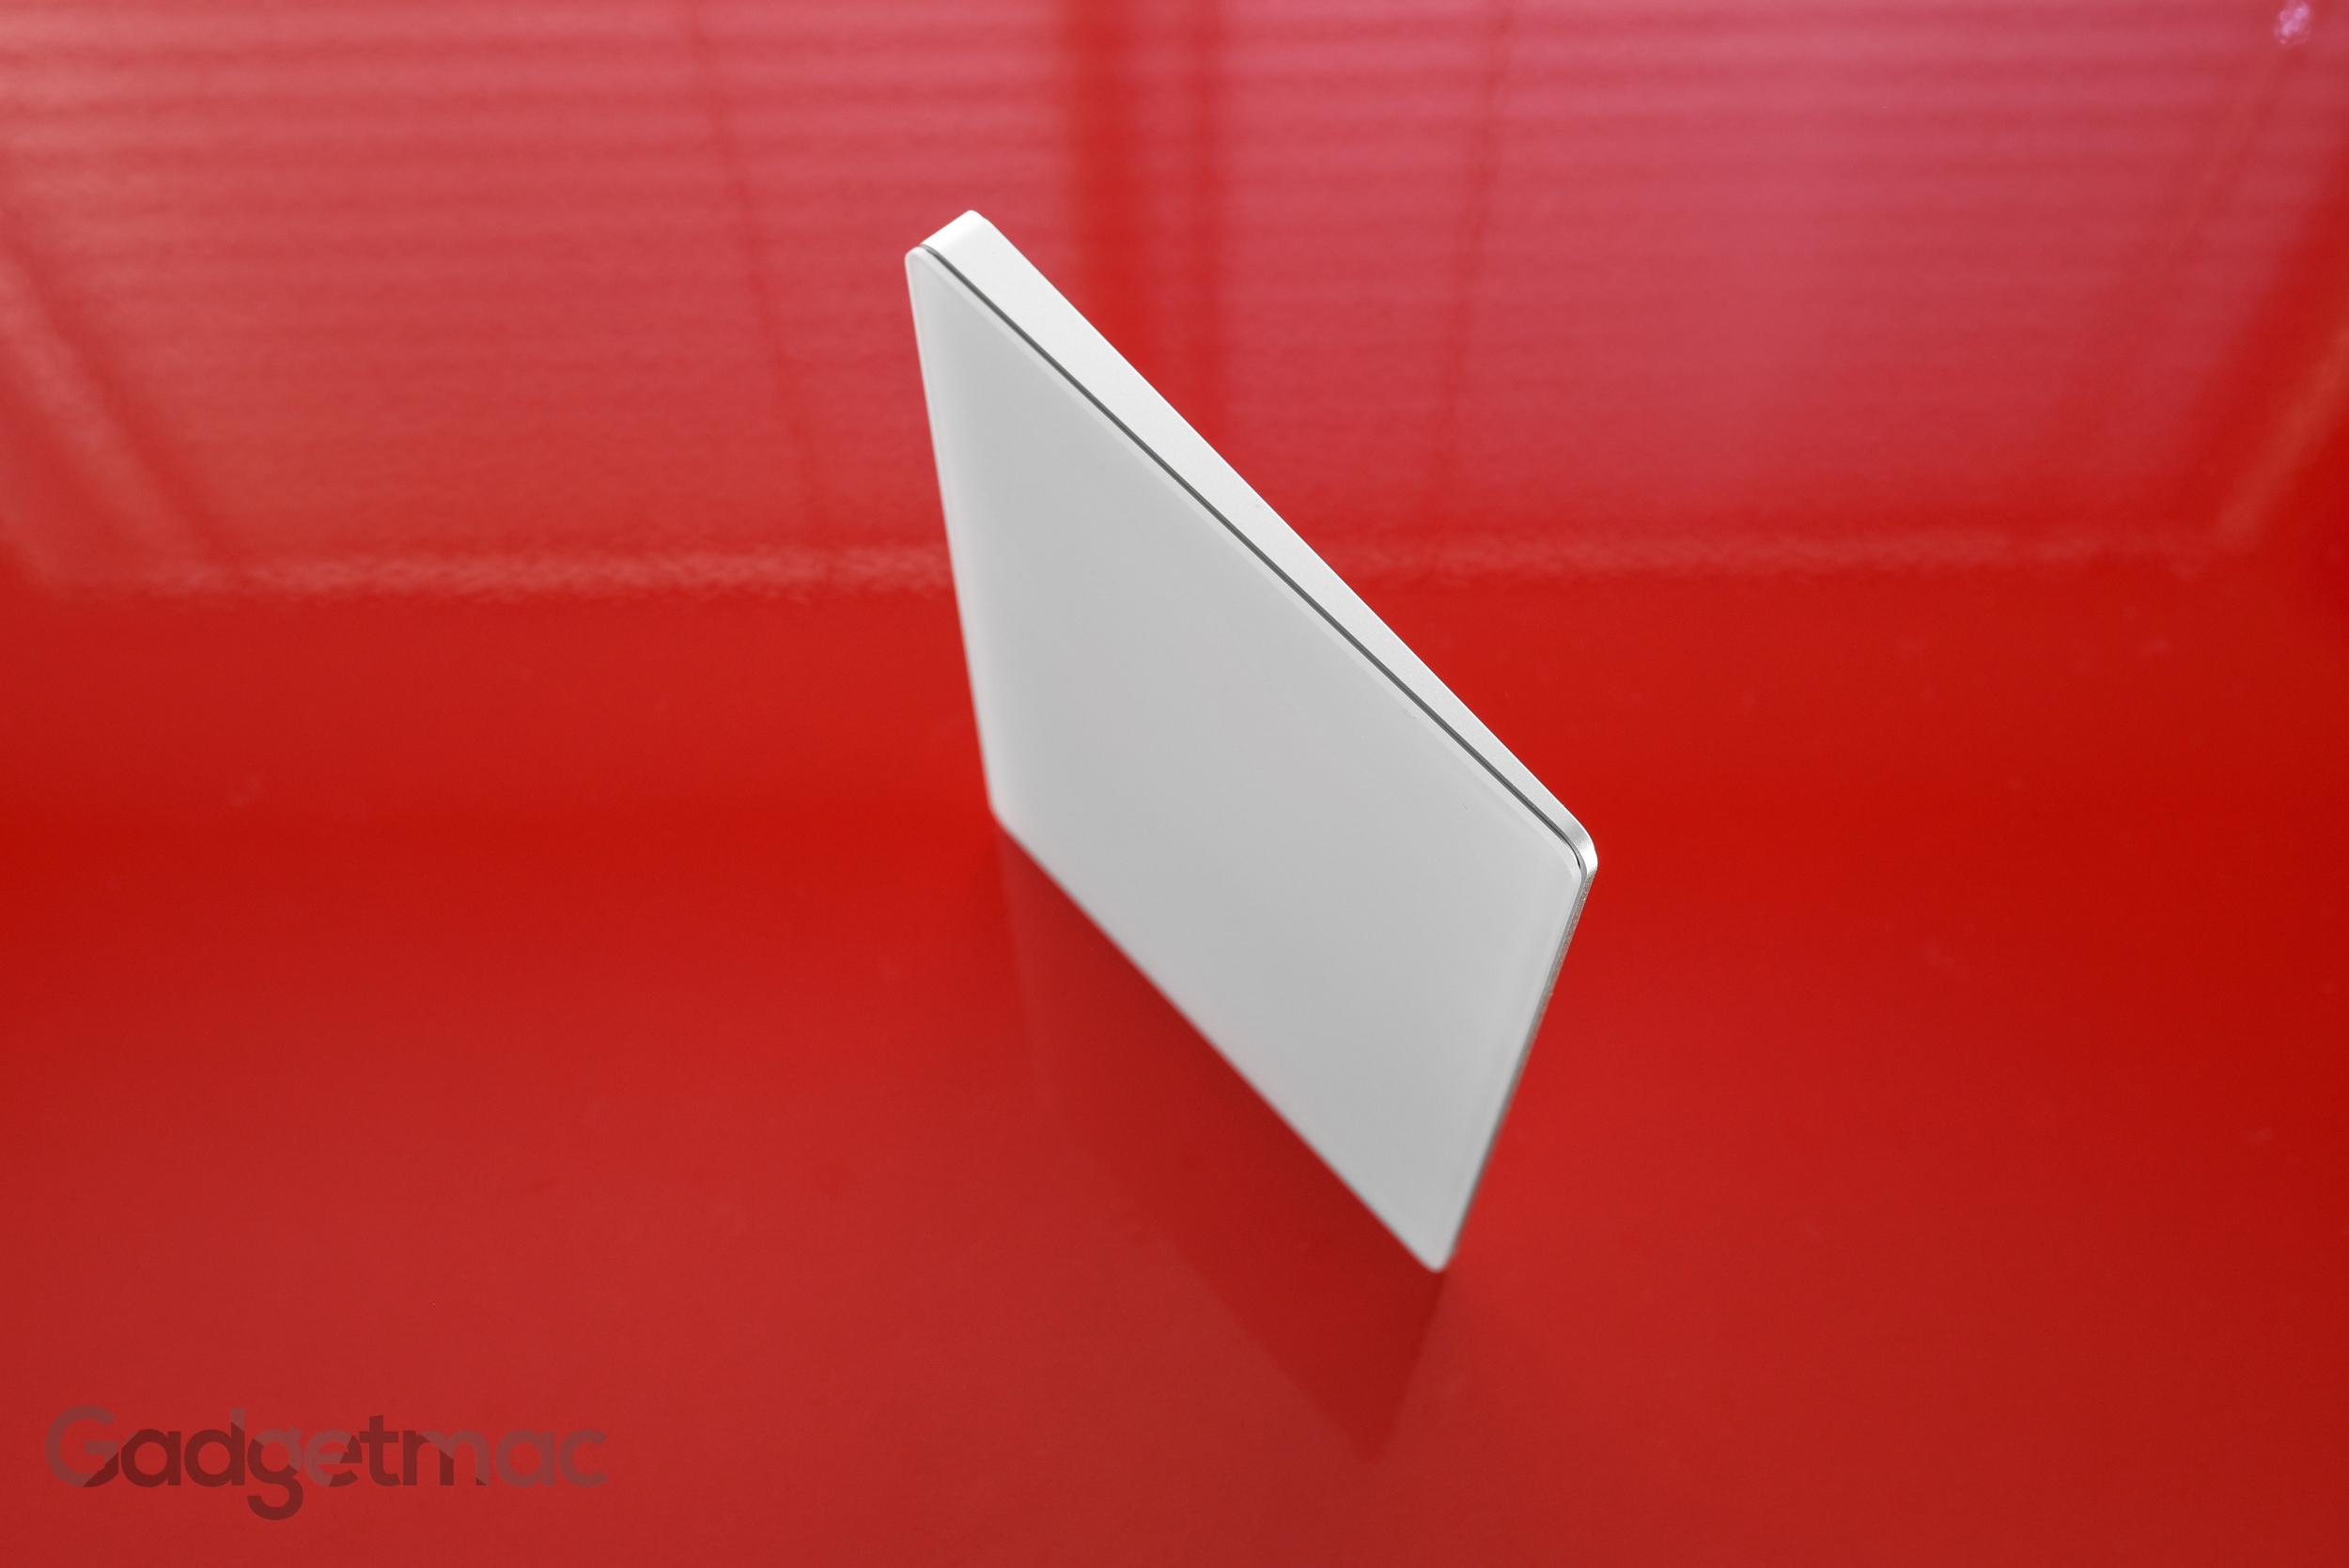 apple-magic-trackpad-2-white-glass.jpg